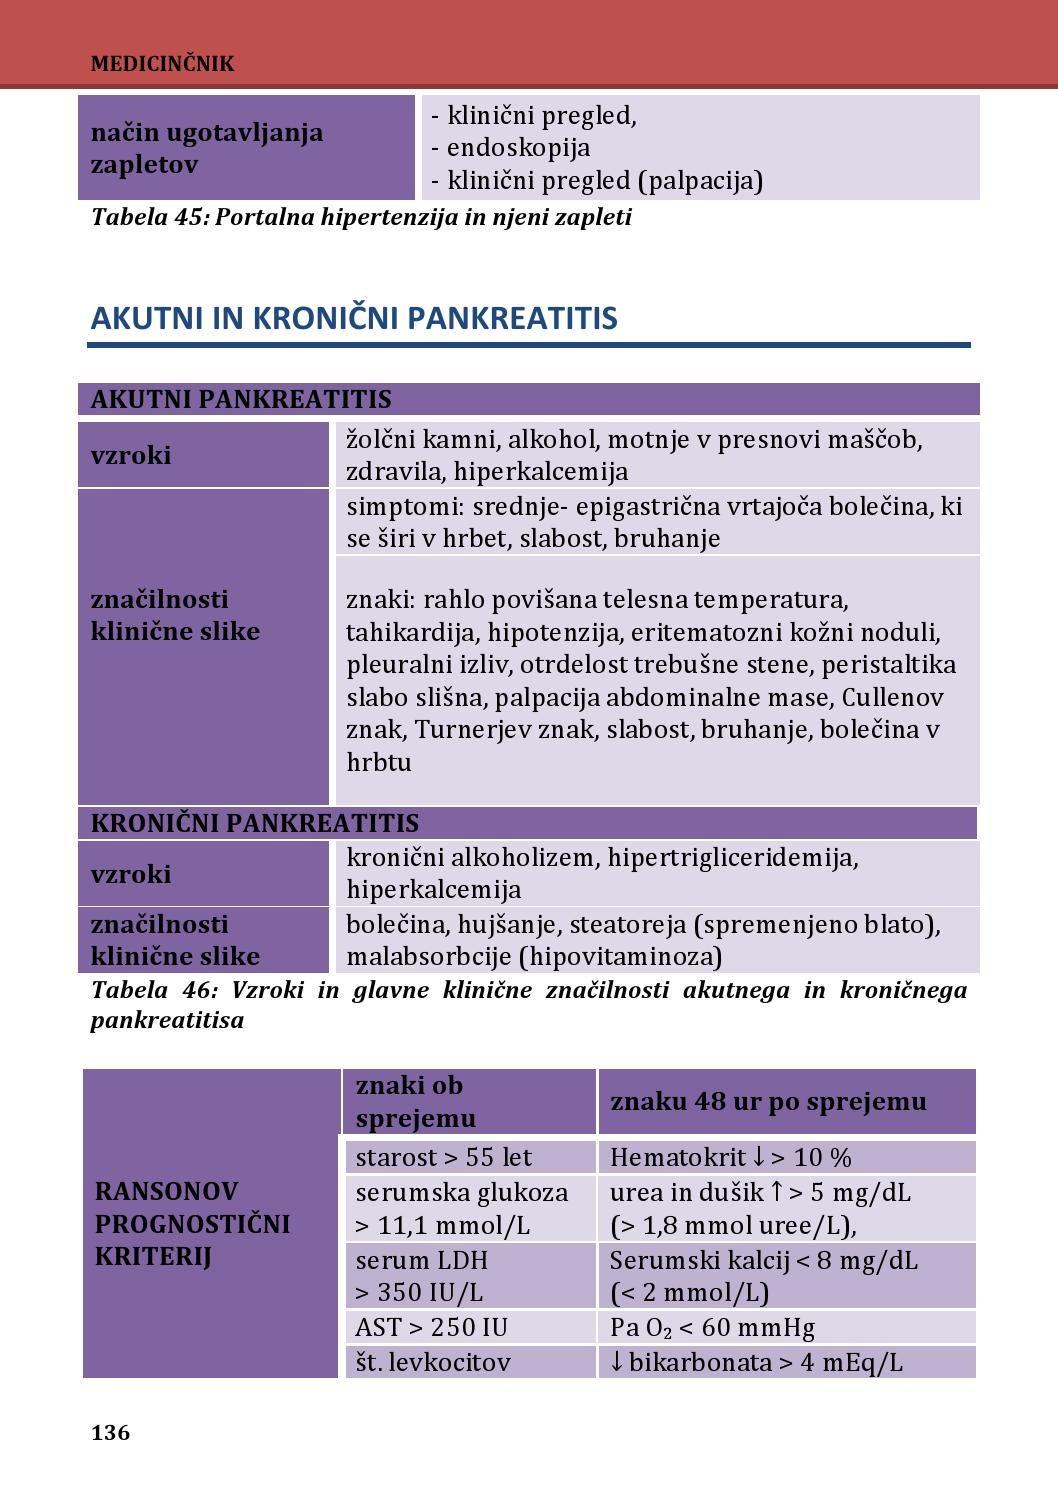 hiperkalcemija hipertenzija